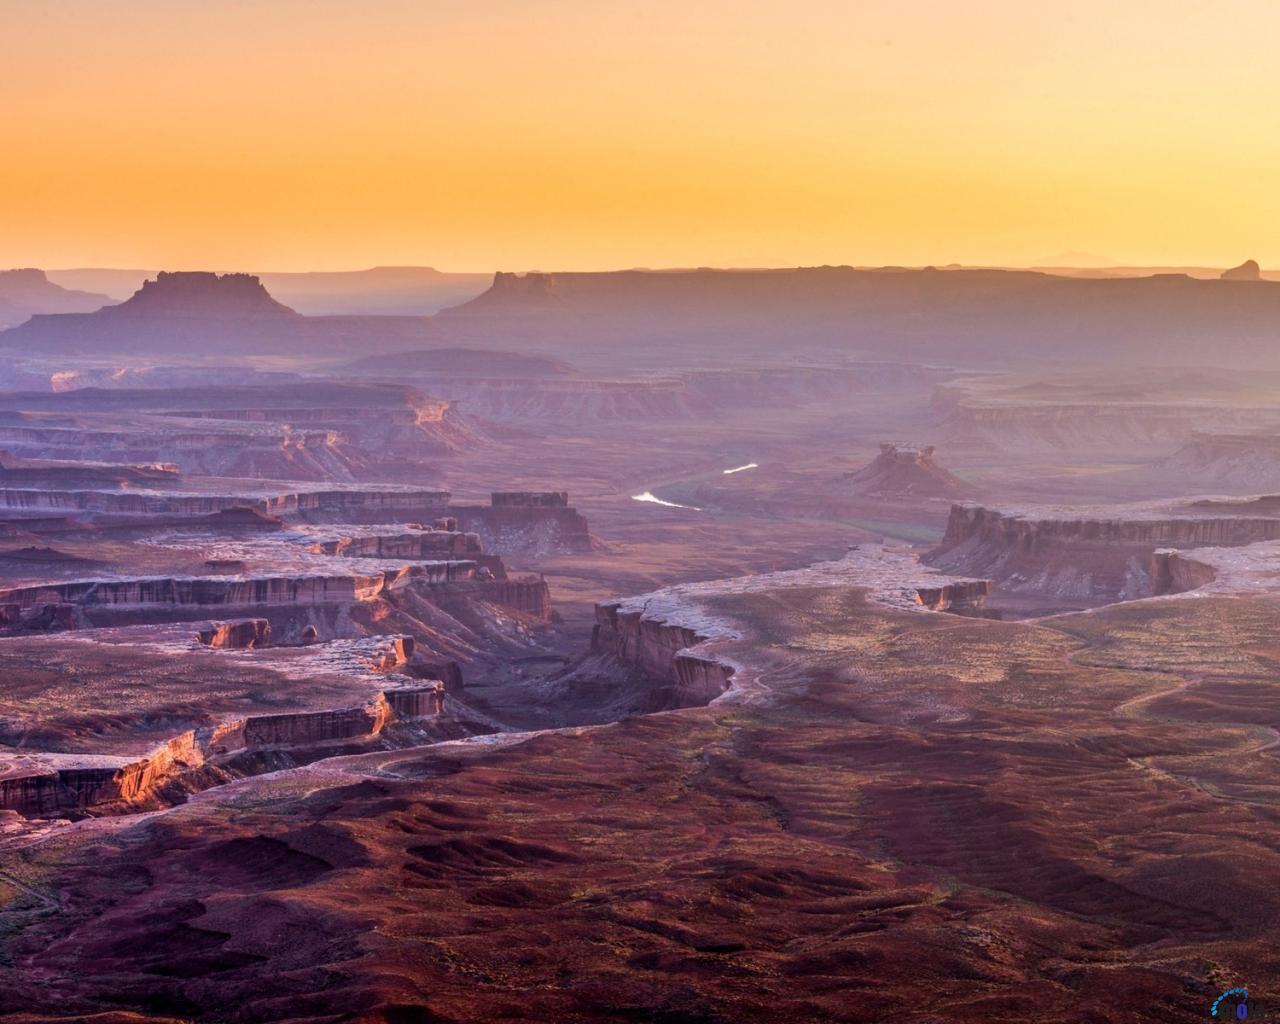 Download Wallpaper Canyonlands National Park Utah USA 1280 x 1024 1280x1024